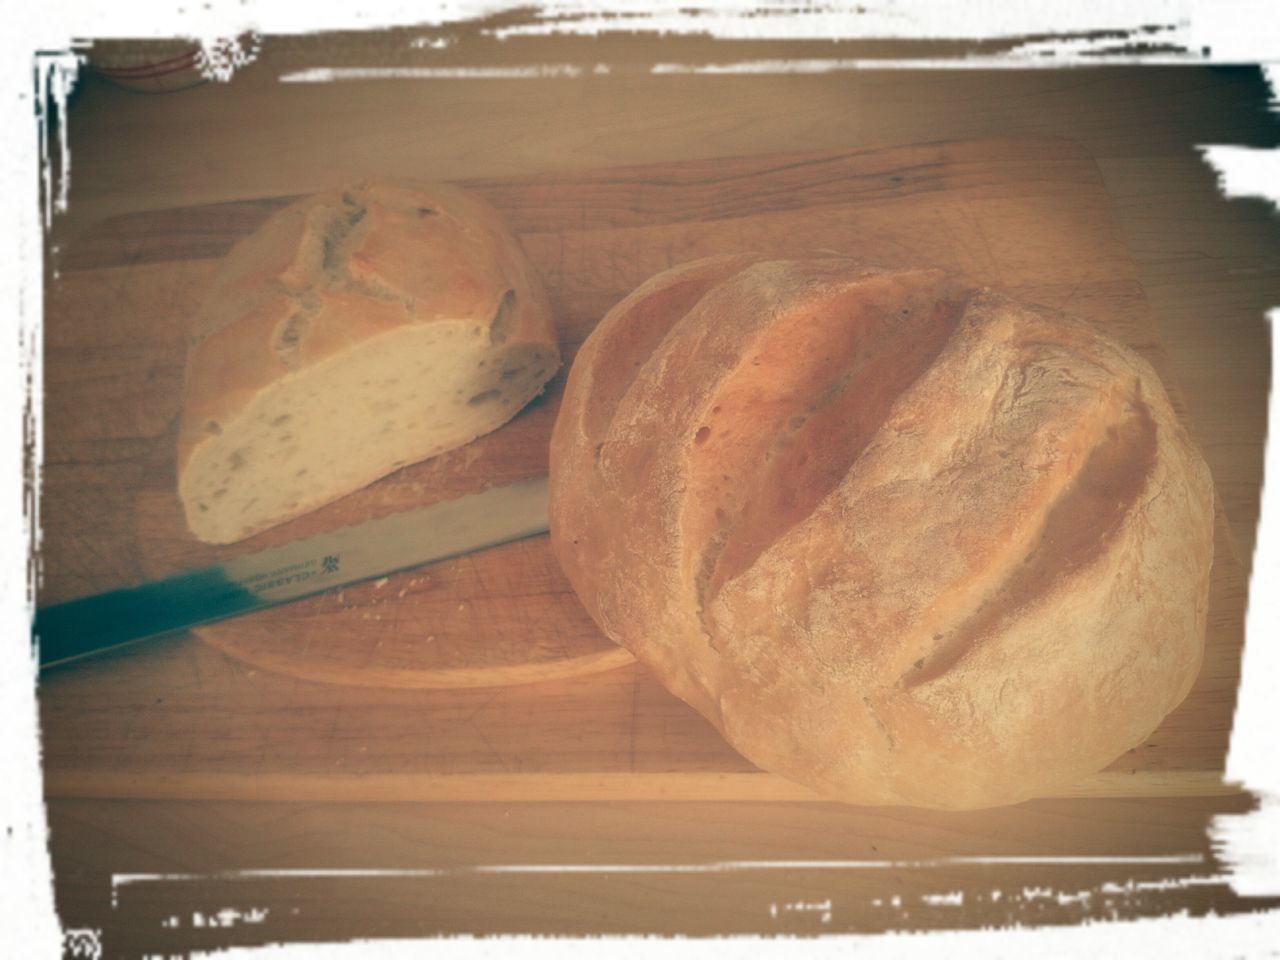 Wie geschnitten Brot Food Foodporn Foodphotography Foodgasm Foodlover Foodporn❤️ Food♡ Foodpic Bread Close-up No People Wheat Freshness Indoors  Day